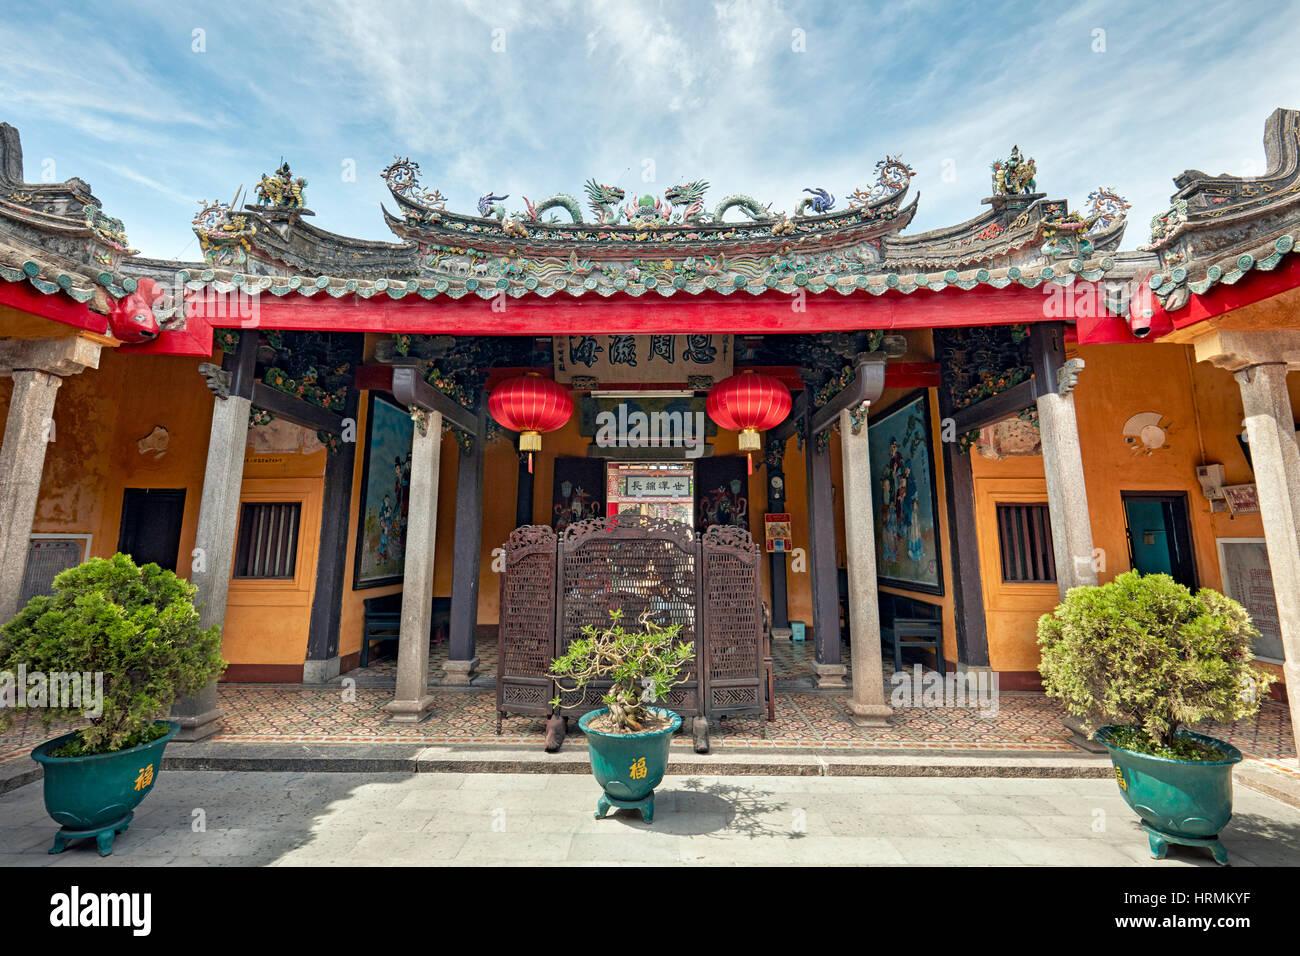 Trieu Chau (Chaozhou) Assembly Hall. Hoi An Ancient Town, Quang Nam Province, Vietnam. - Stock Image